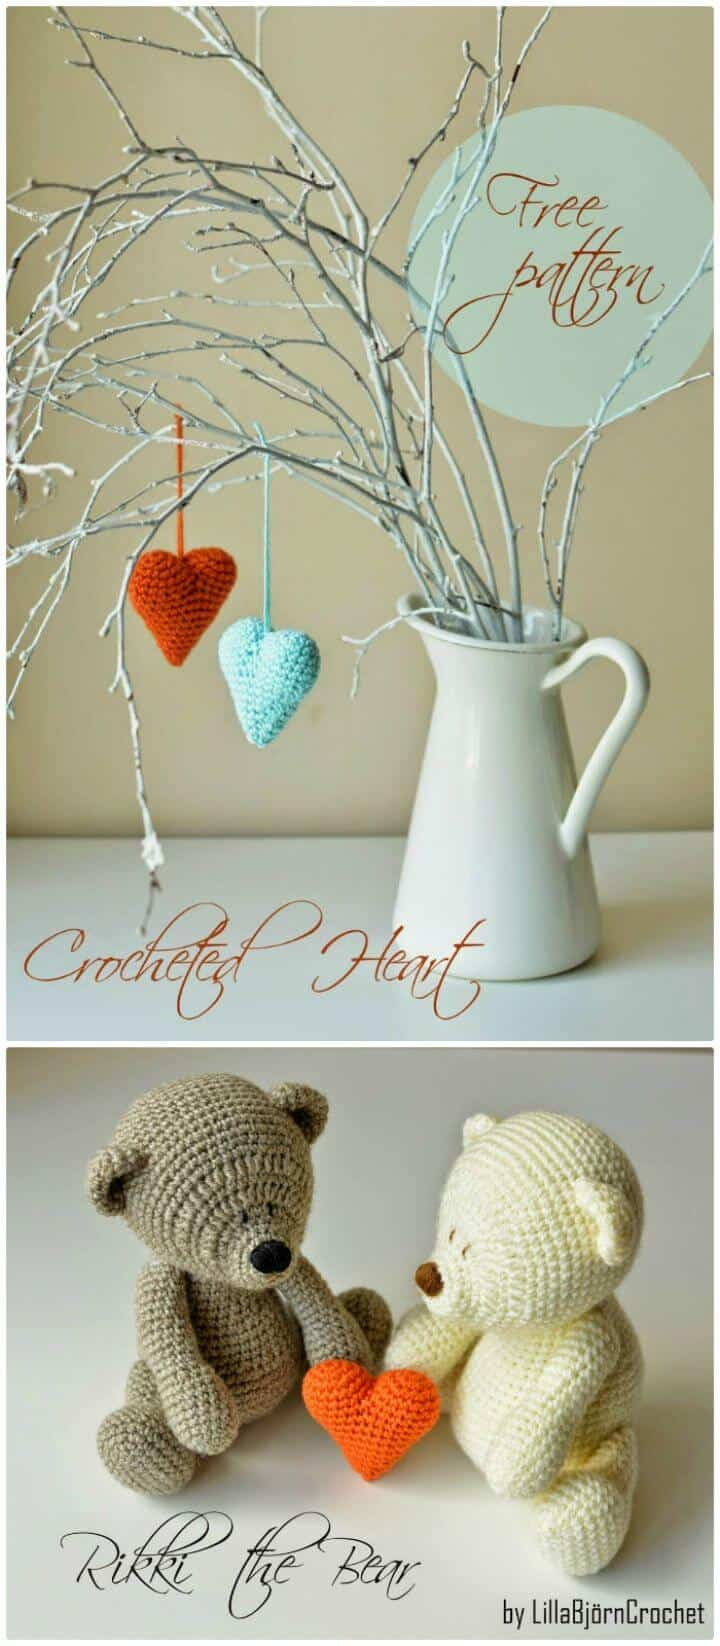 Easy Crochet Heart Pattern And Rikki Bear - Free Valentine Day Pattern